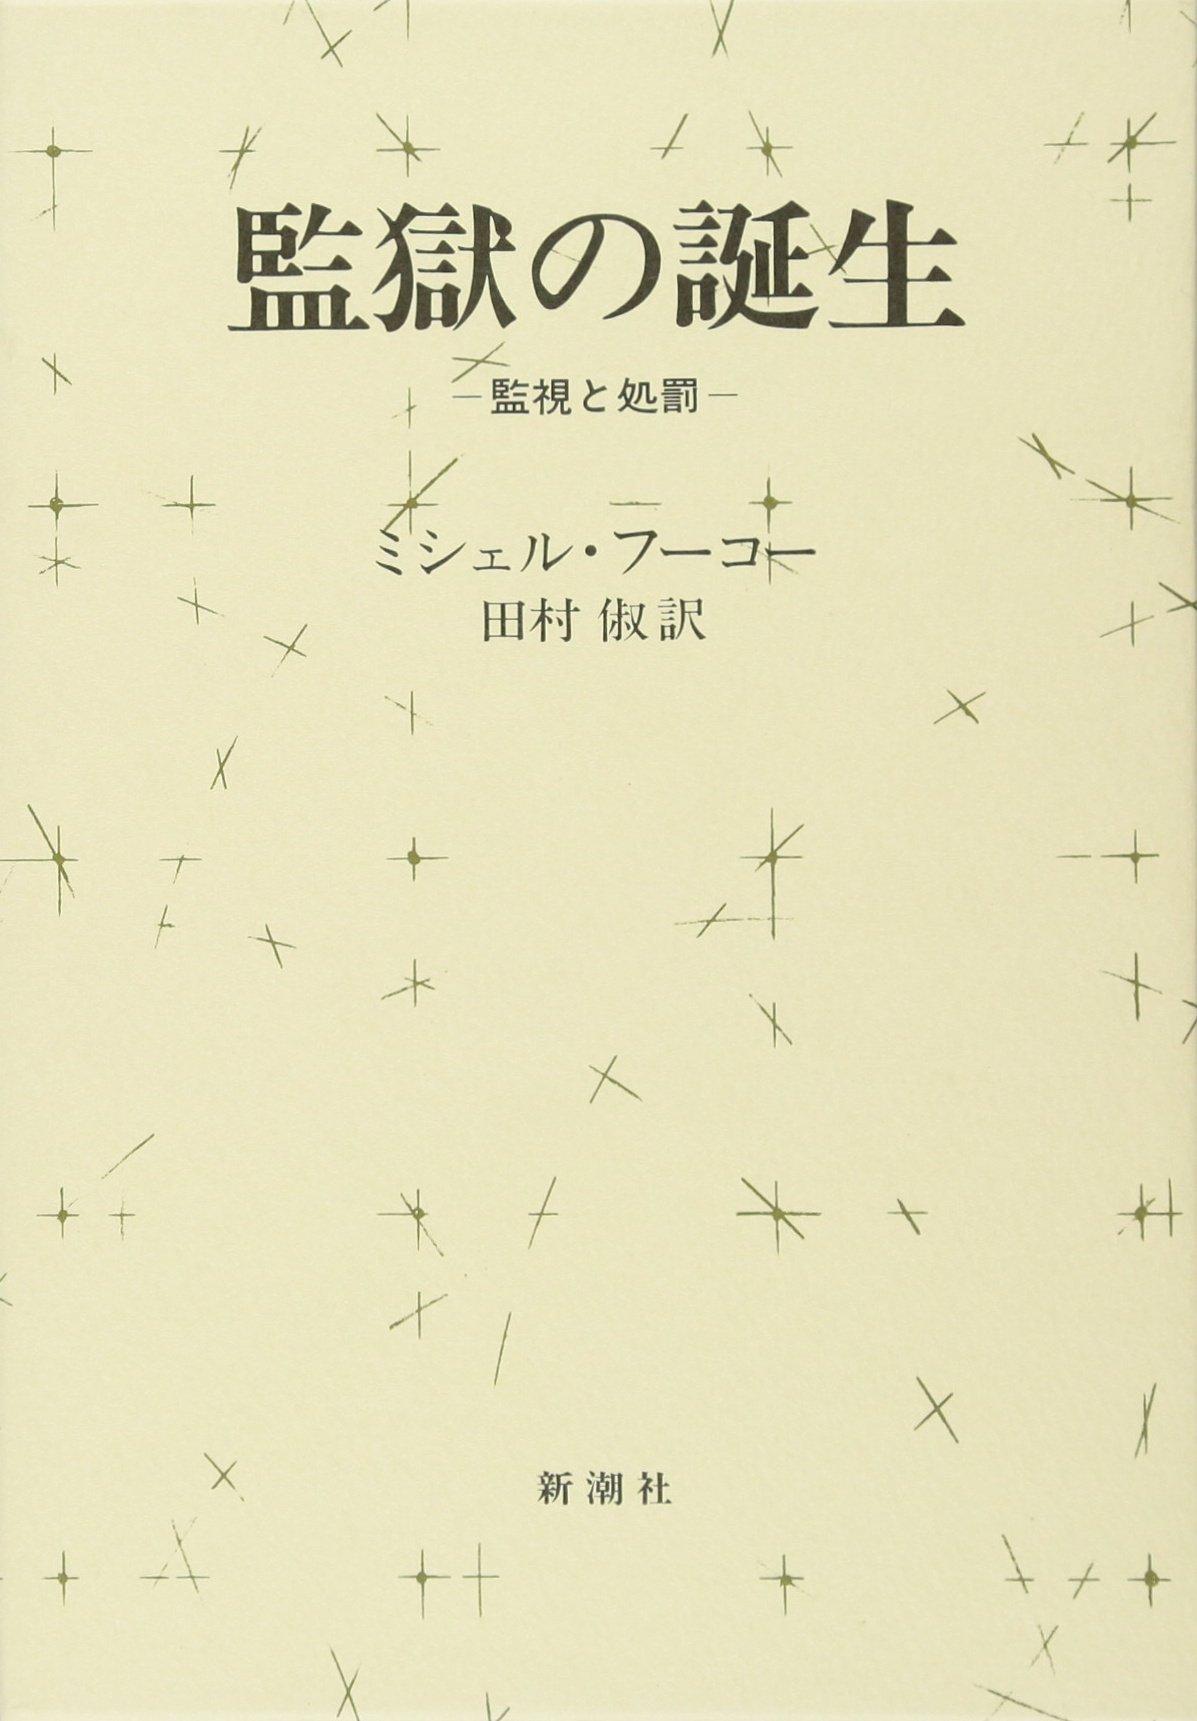 amazarashi, 監獄の誕生